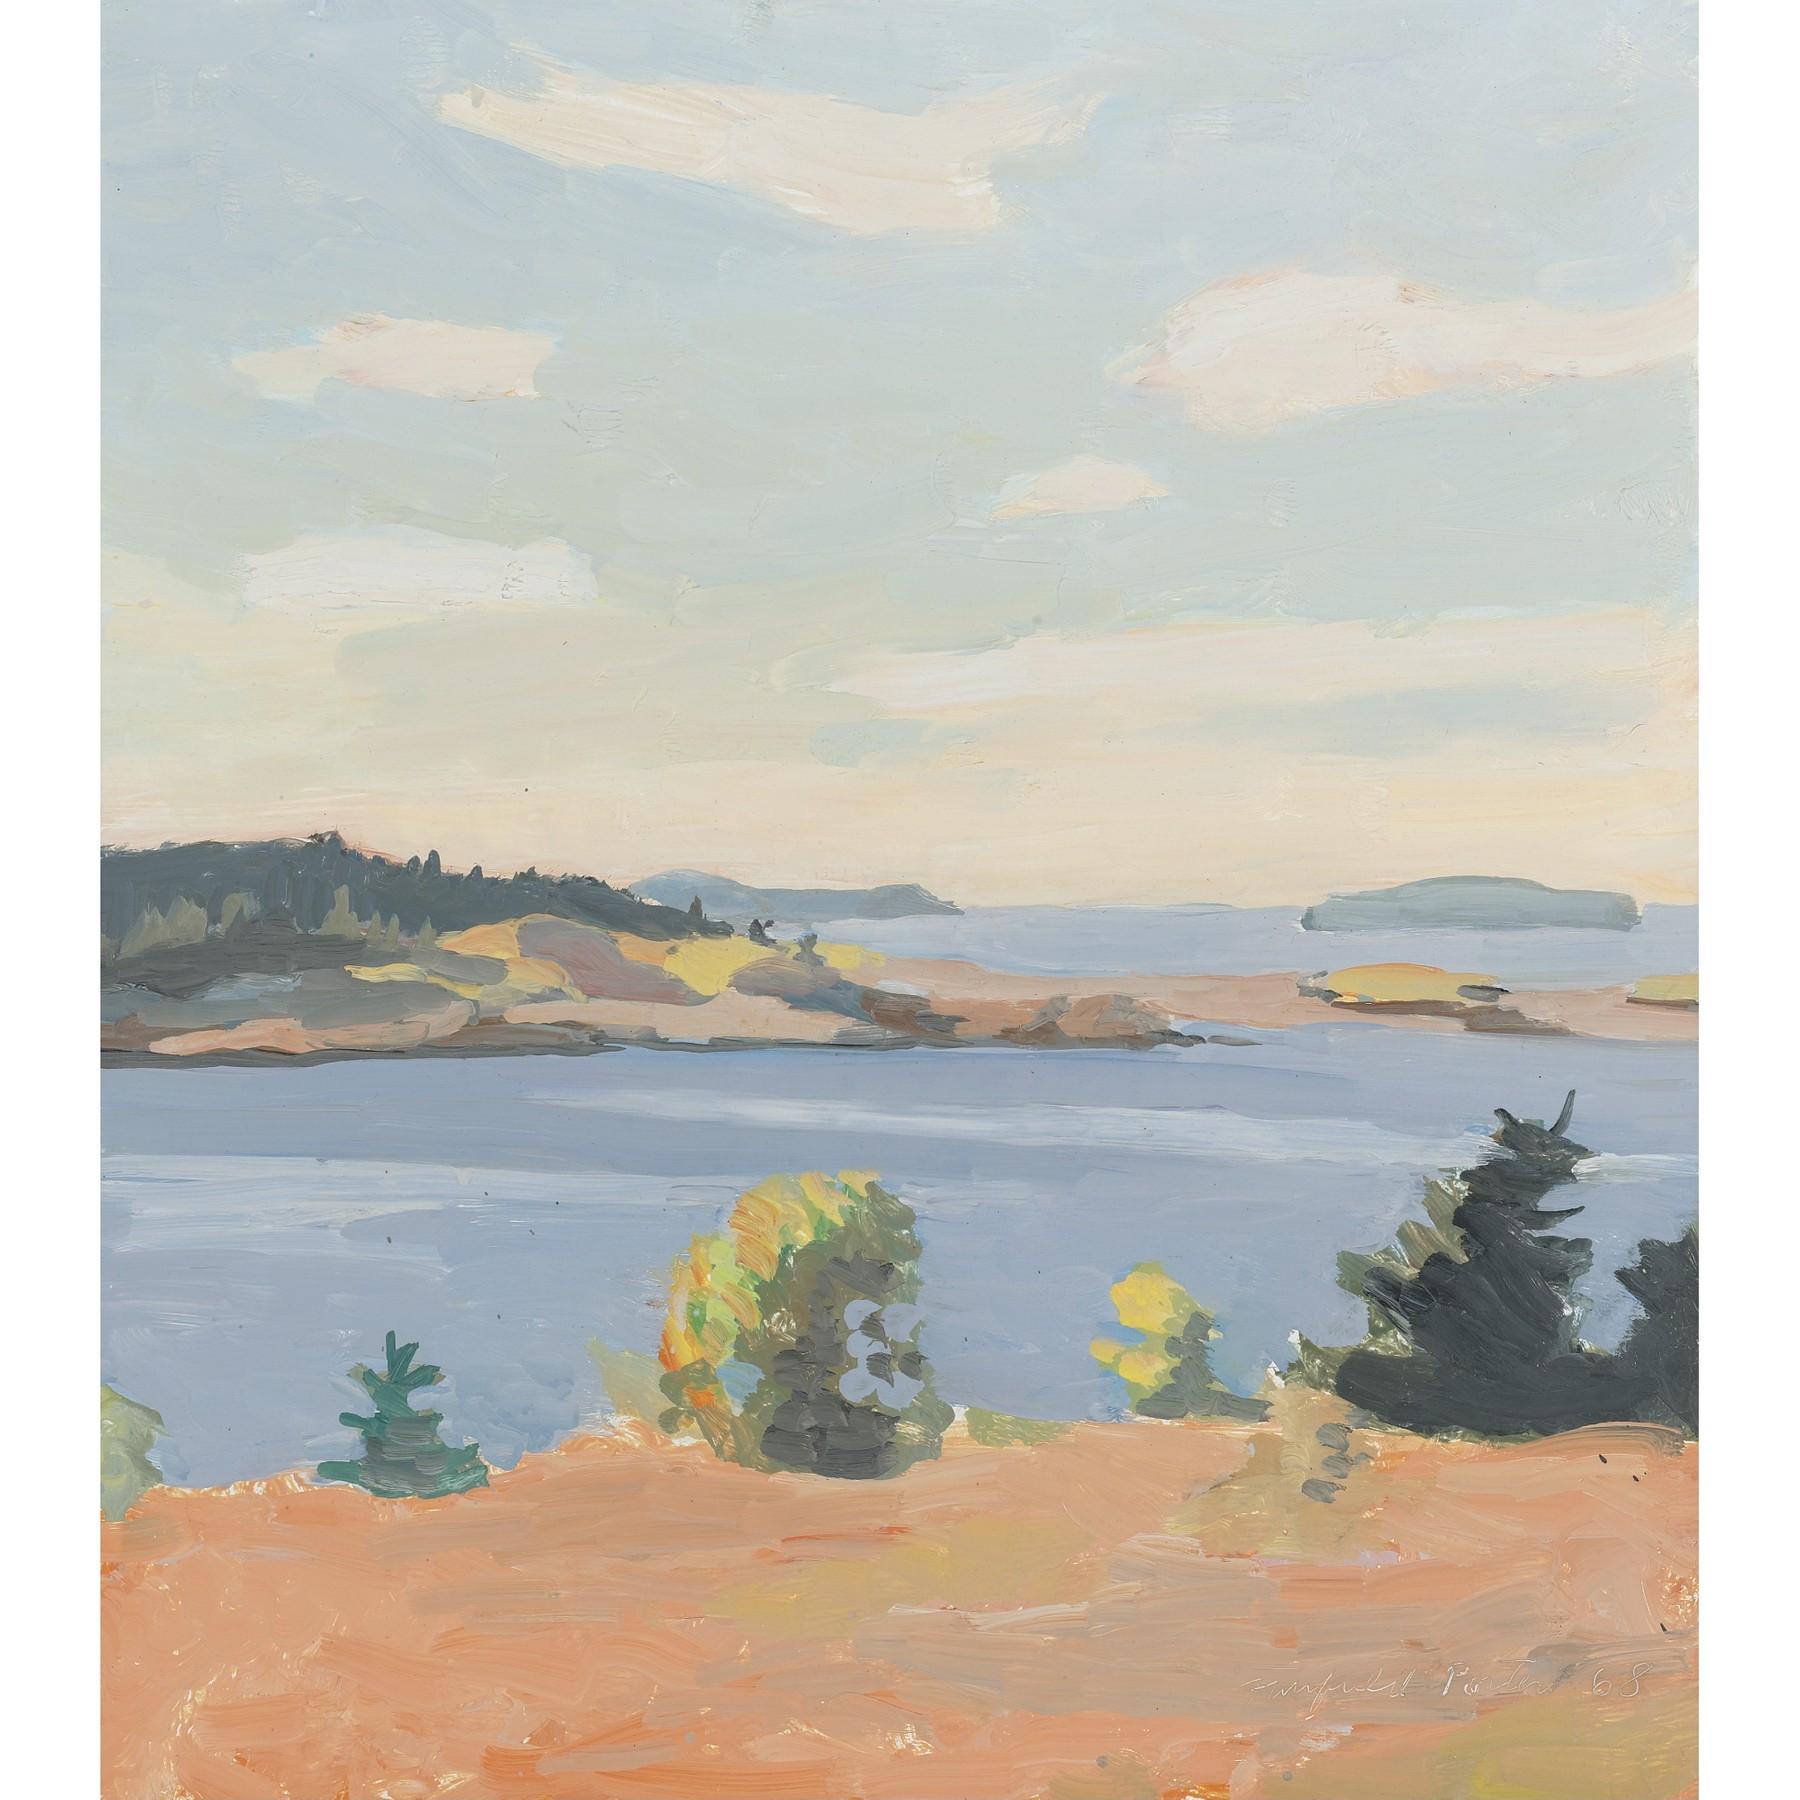 Fairfield Porter, View Of Penobscot Bay, Maine, 1968